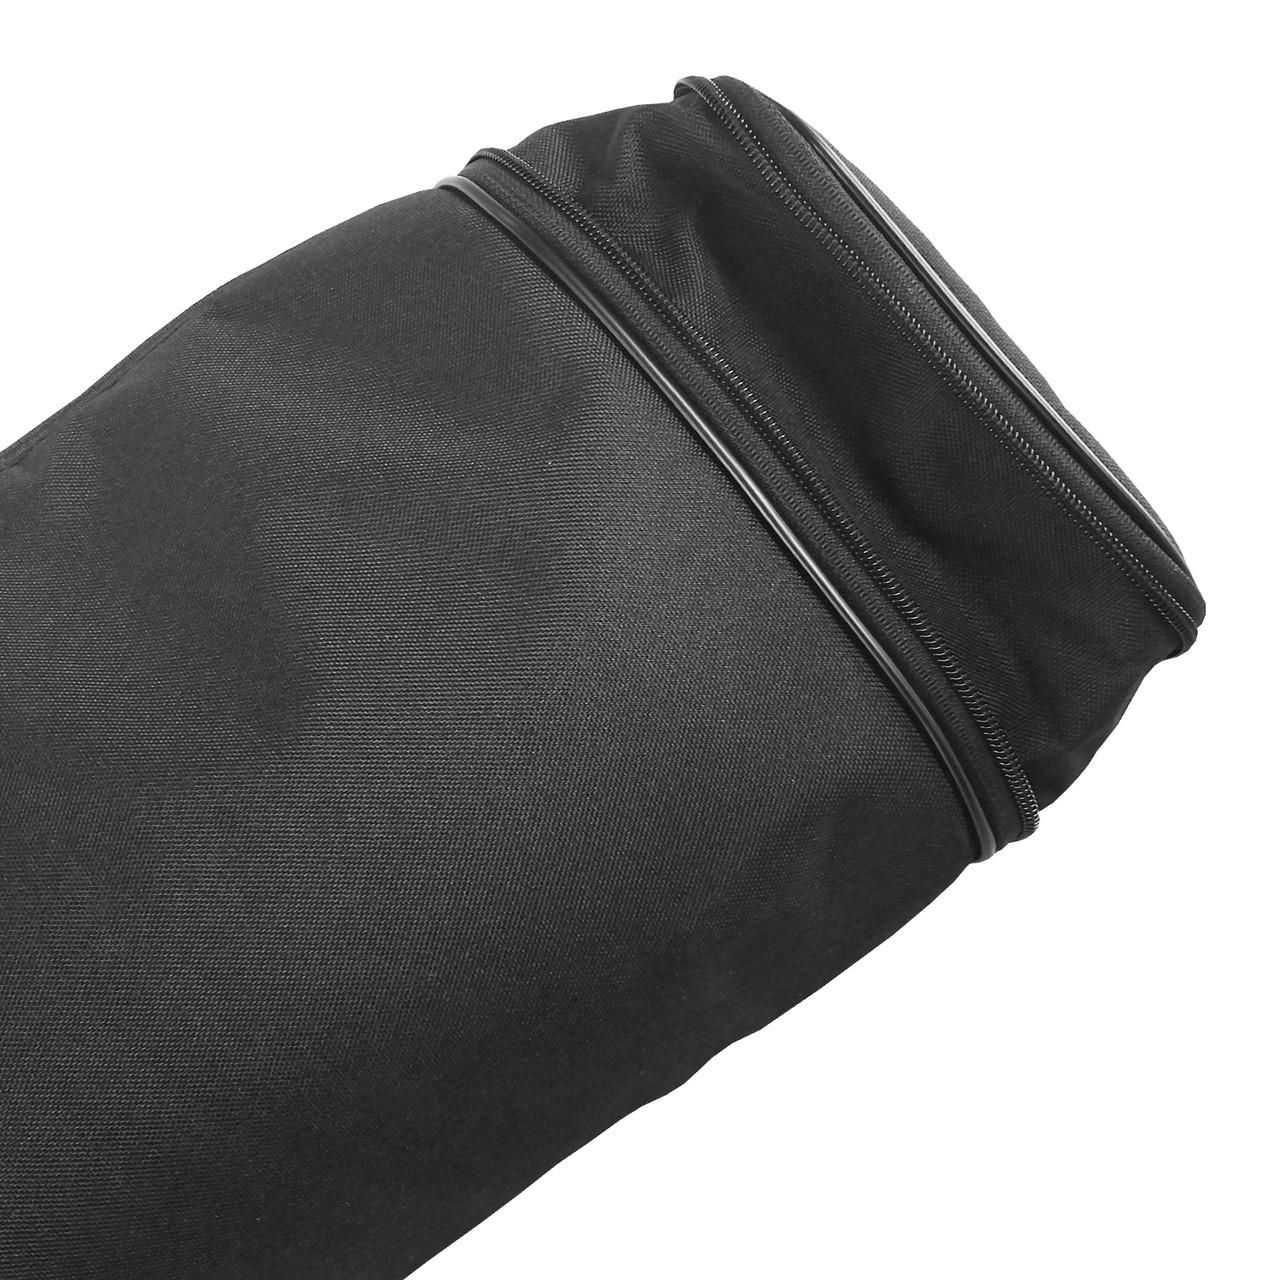 Pool Case Travel Bag - Zipper Extension